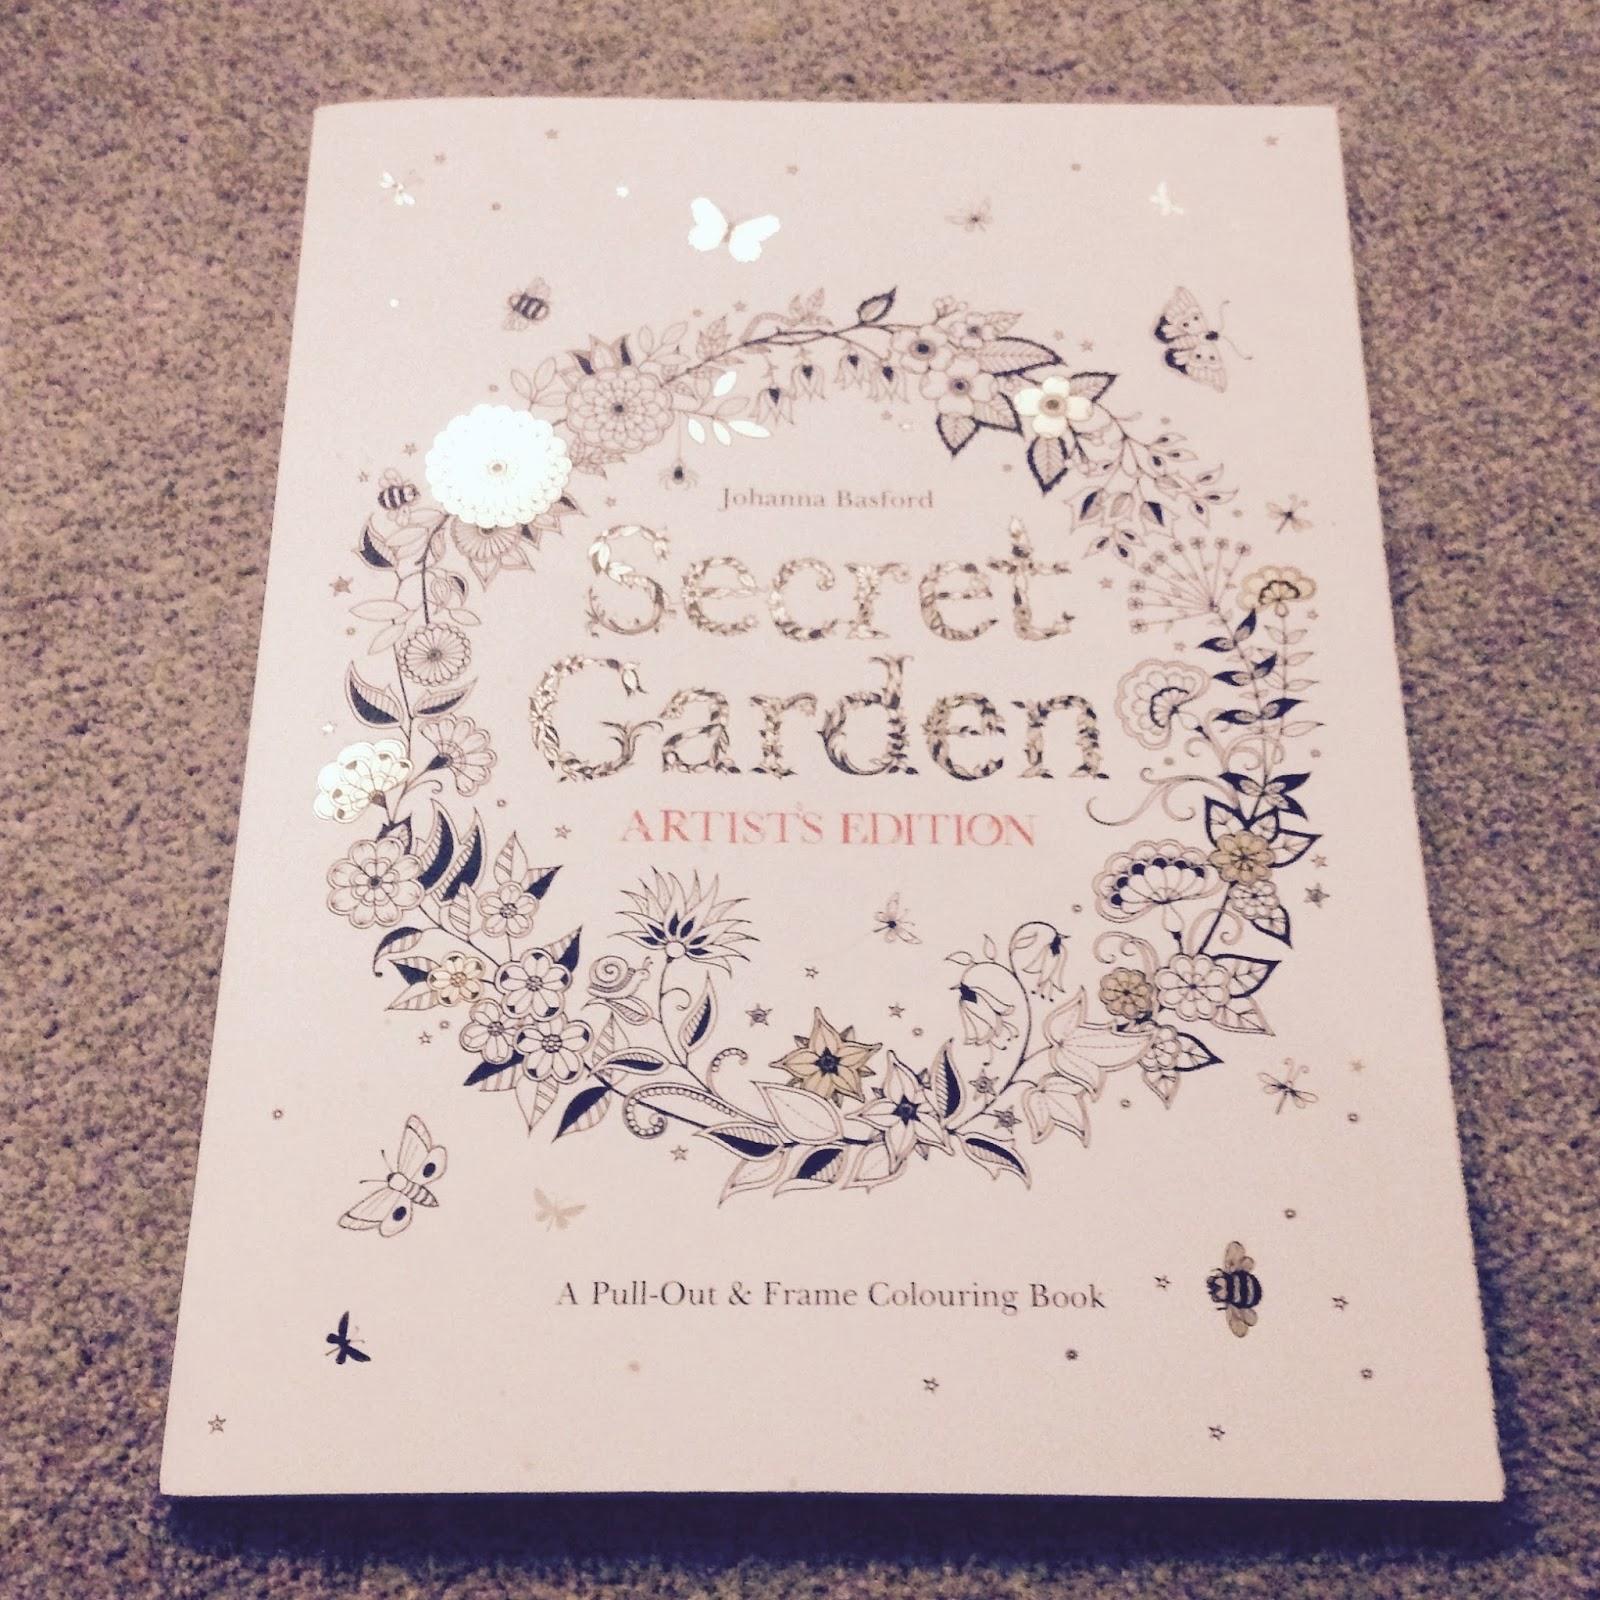 Secret Garden Artists Edition By Johanna Basford